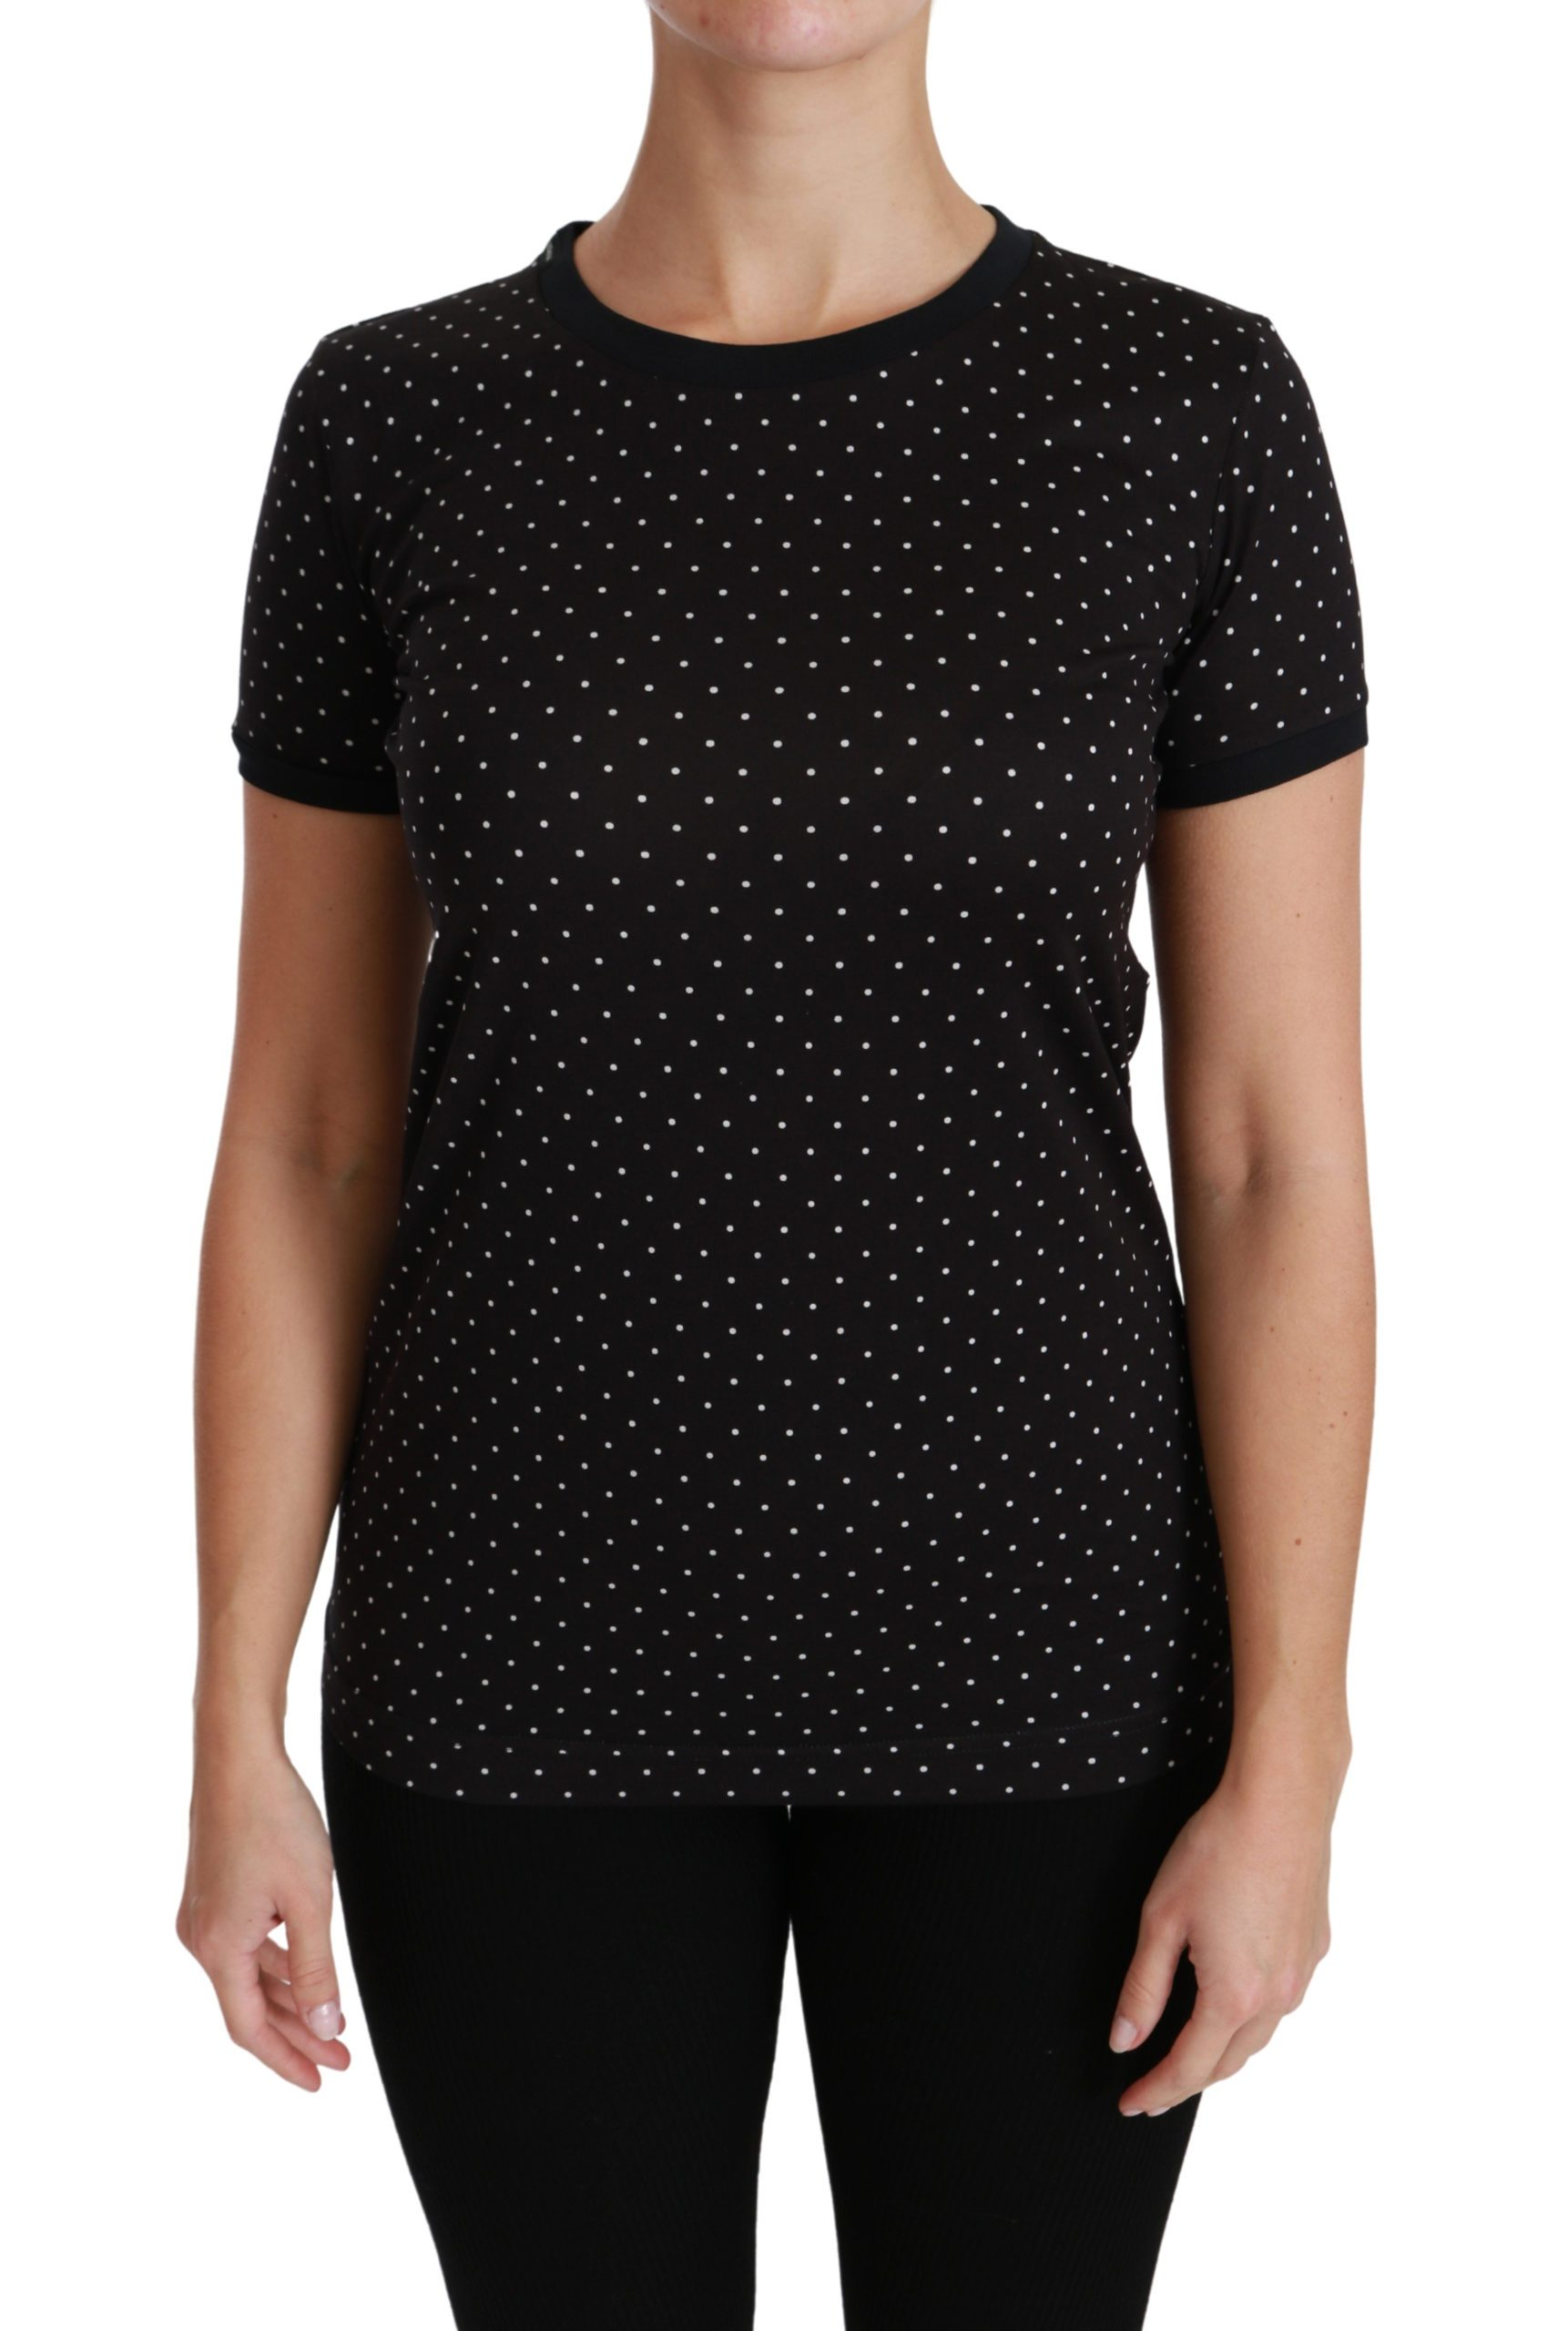 Dolce & Gabbana Women's Short sleeve T-shirts Black TSH4431 - IT36 | XS